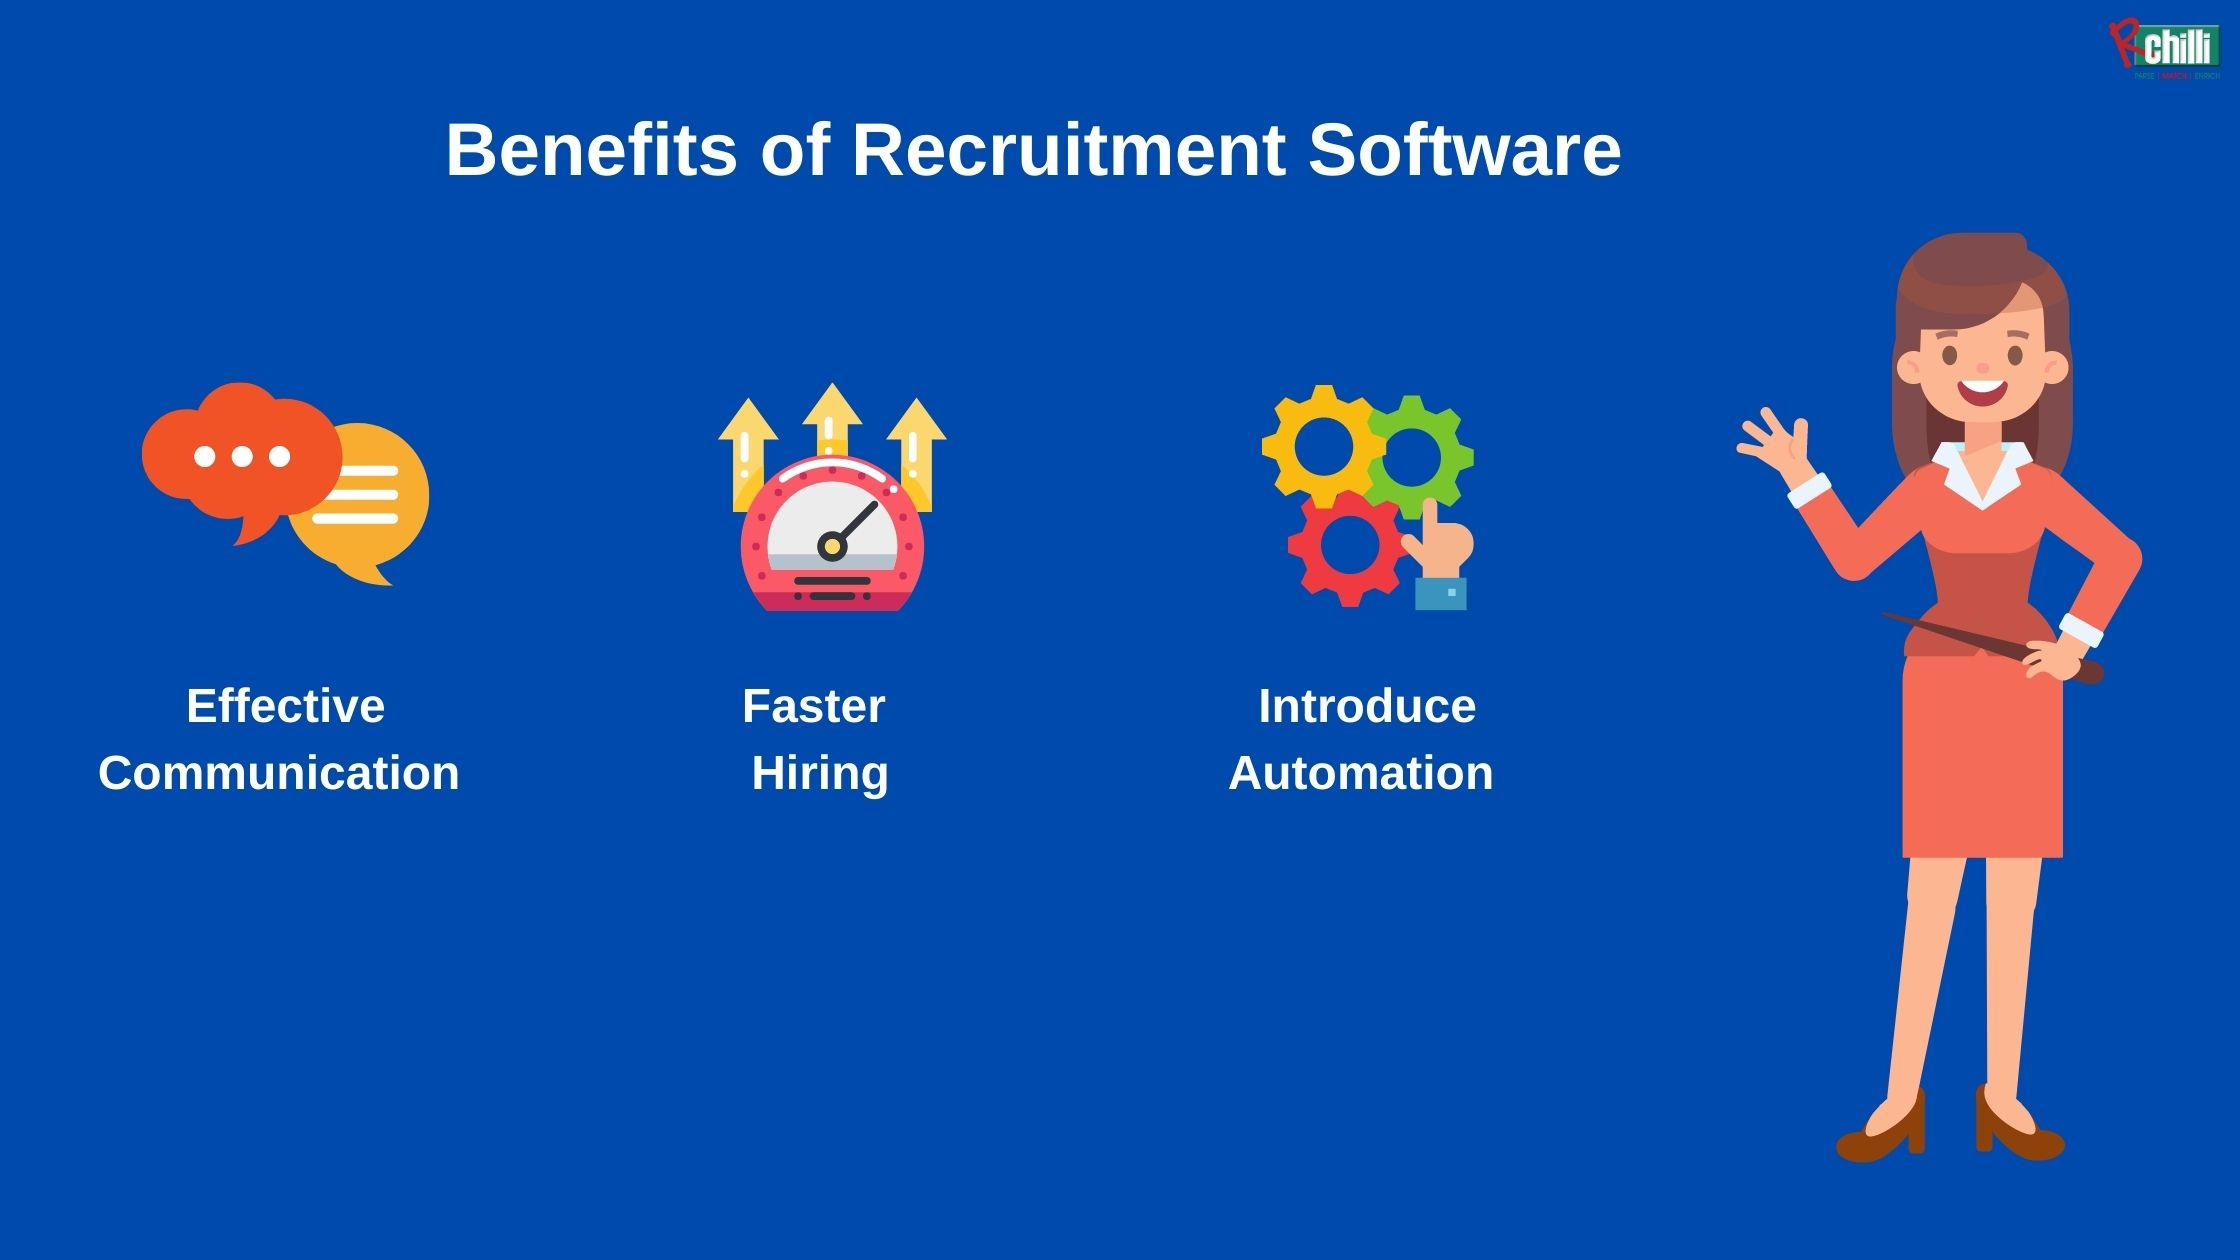 Benefits of Recruitment Software (1)